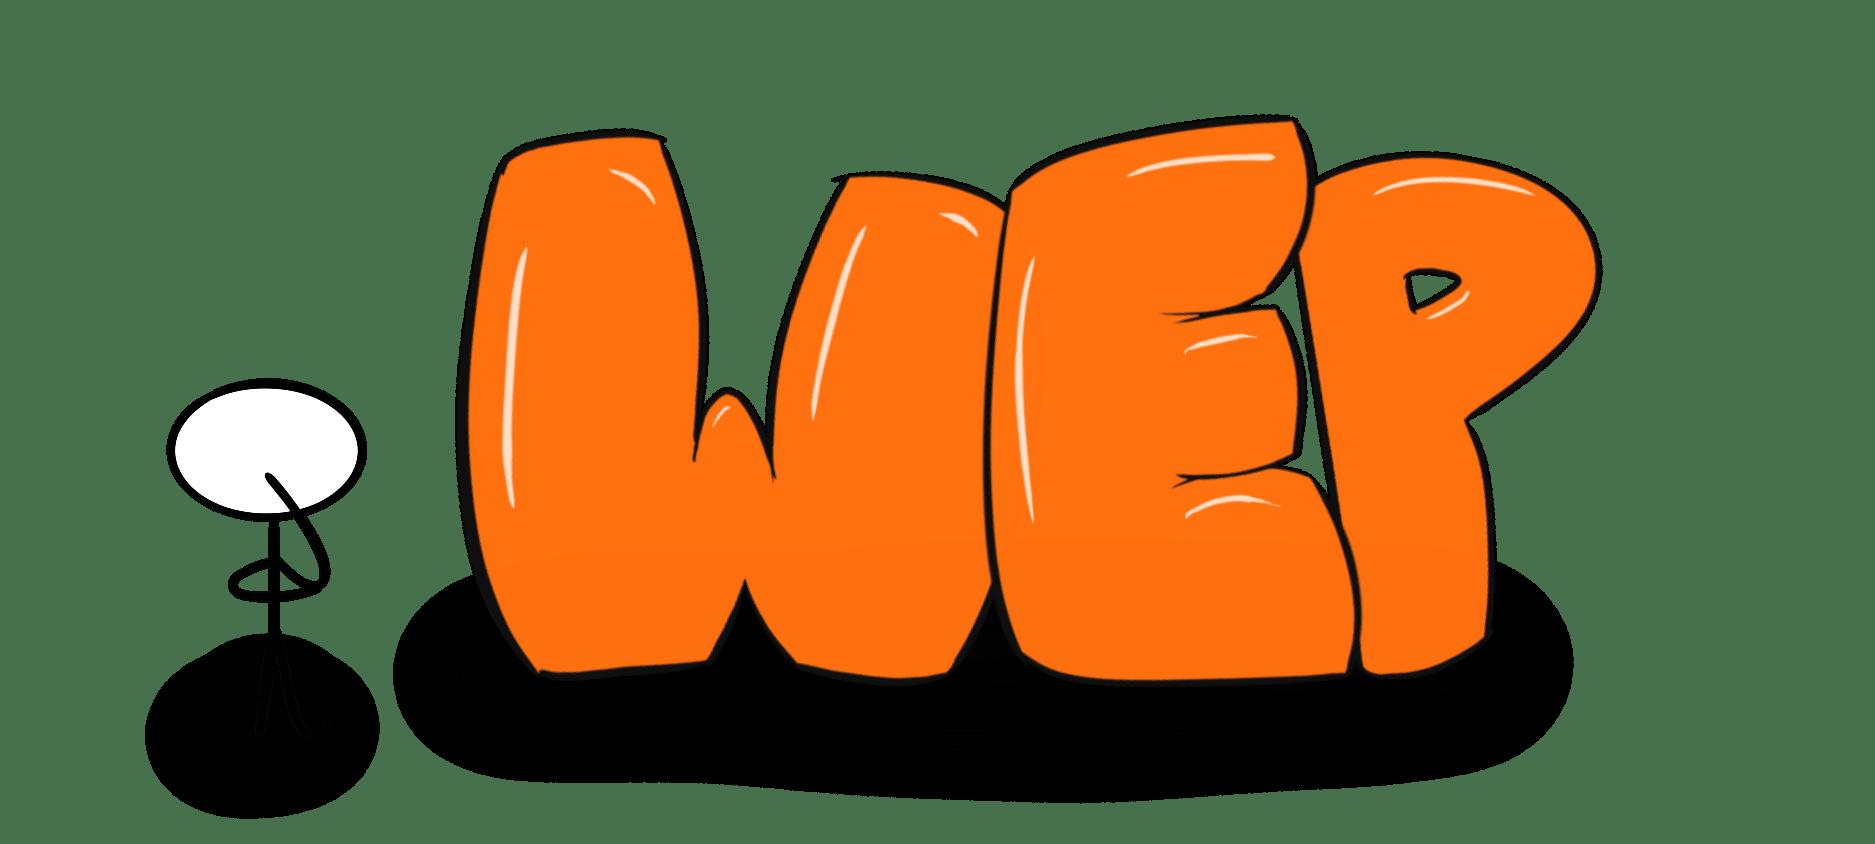 WEP illustration